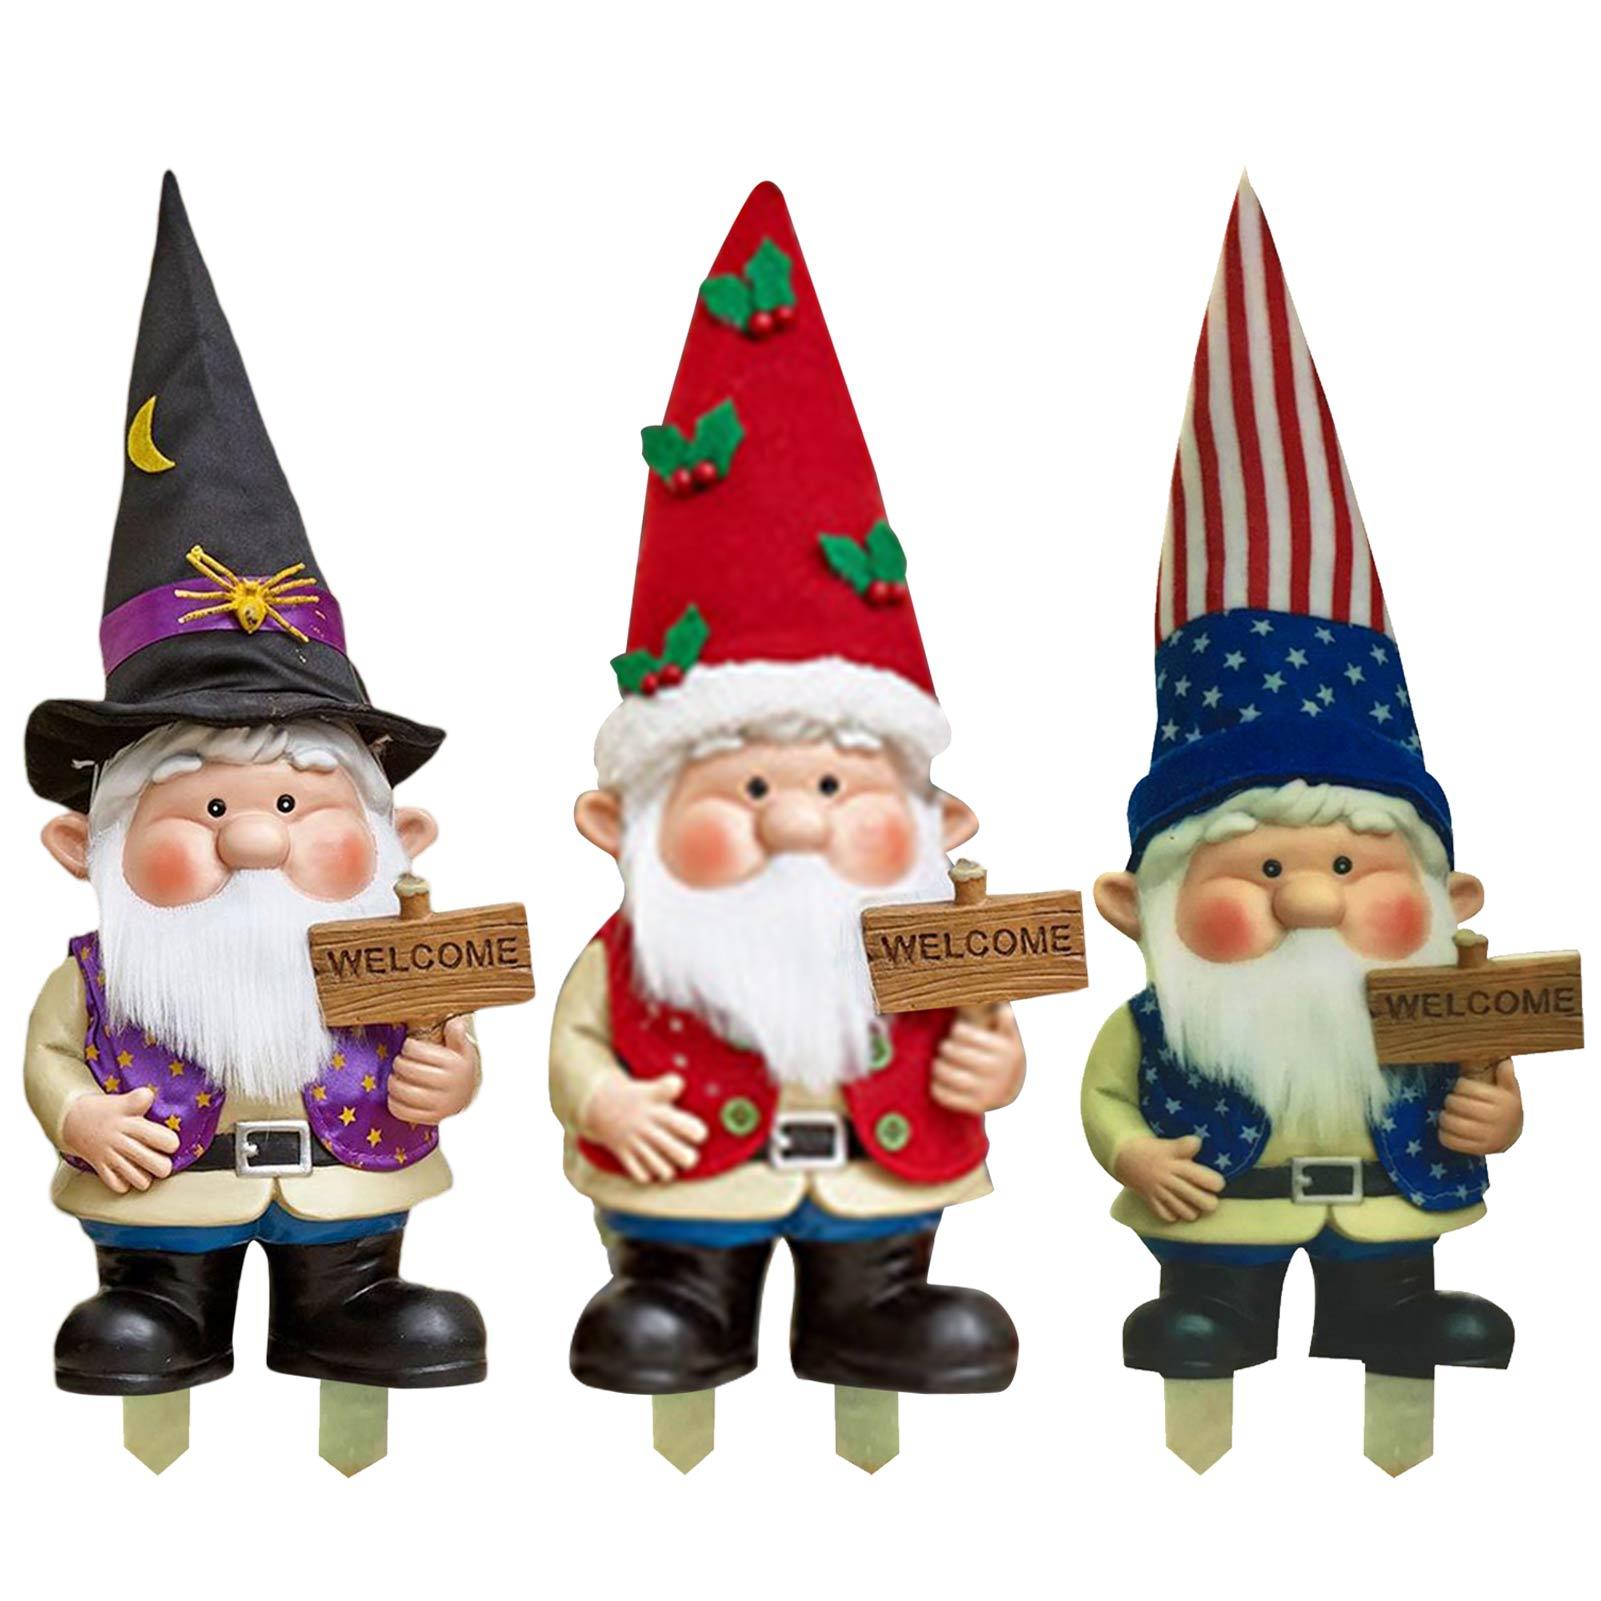 Large Garden Gnome Statue Lawn Ornament Outdoor Gnomes Figurine Funny Cute Garden Sculpture Gnomes Welcome Sign Dwarfs #